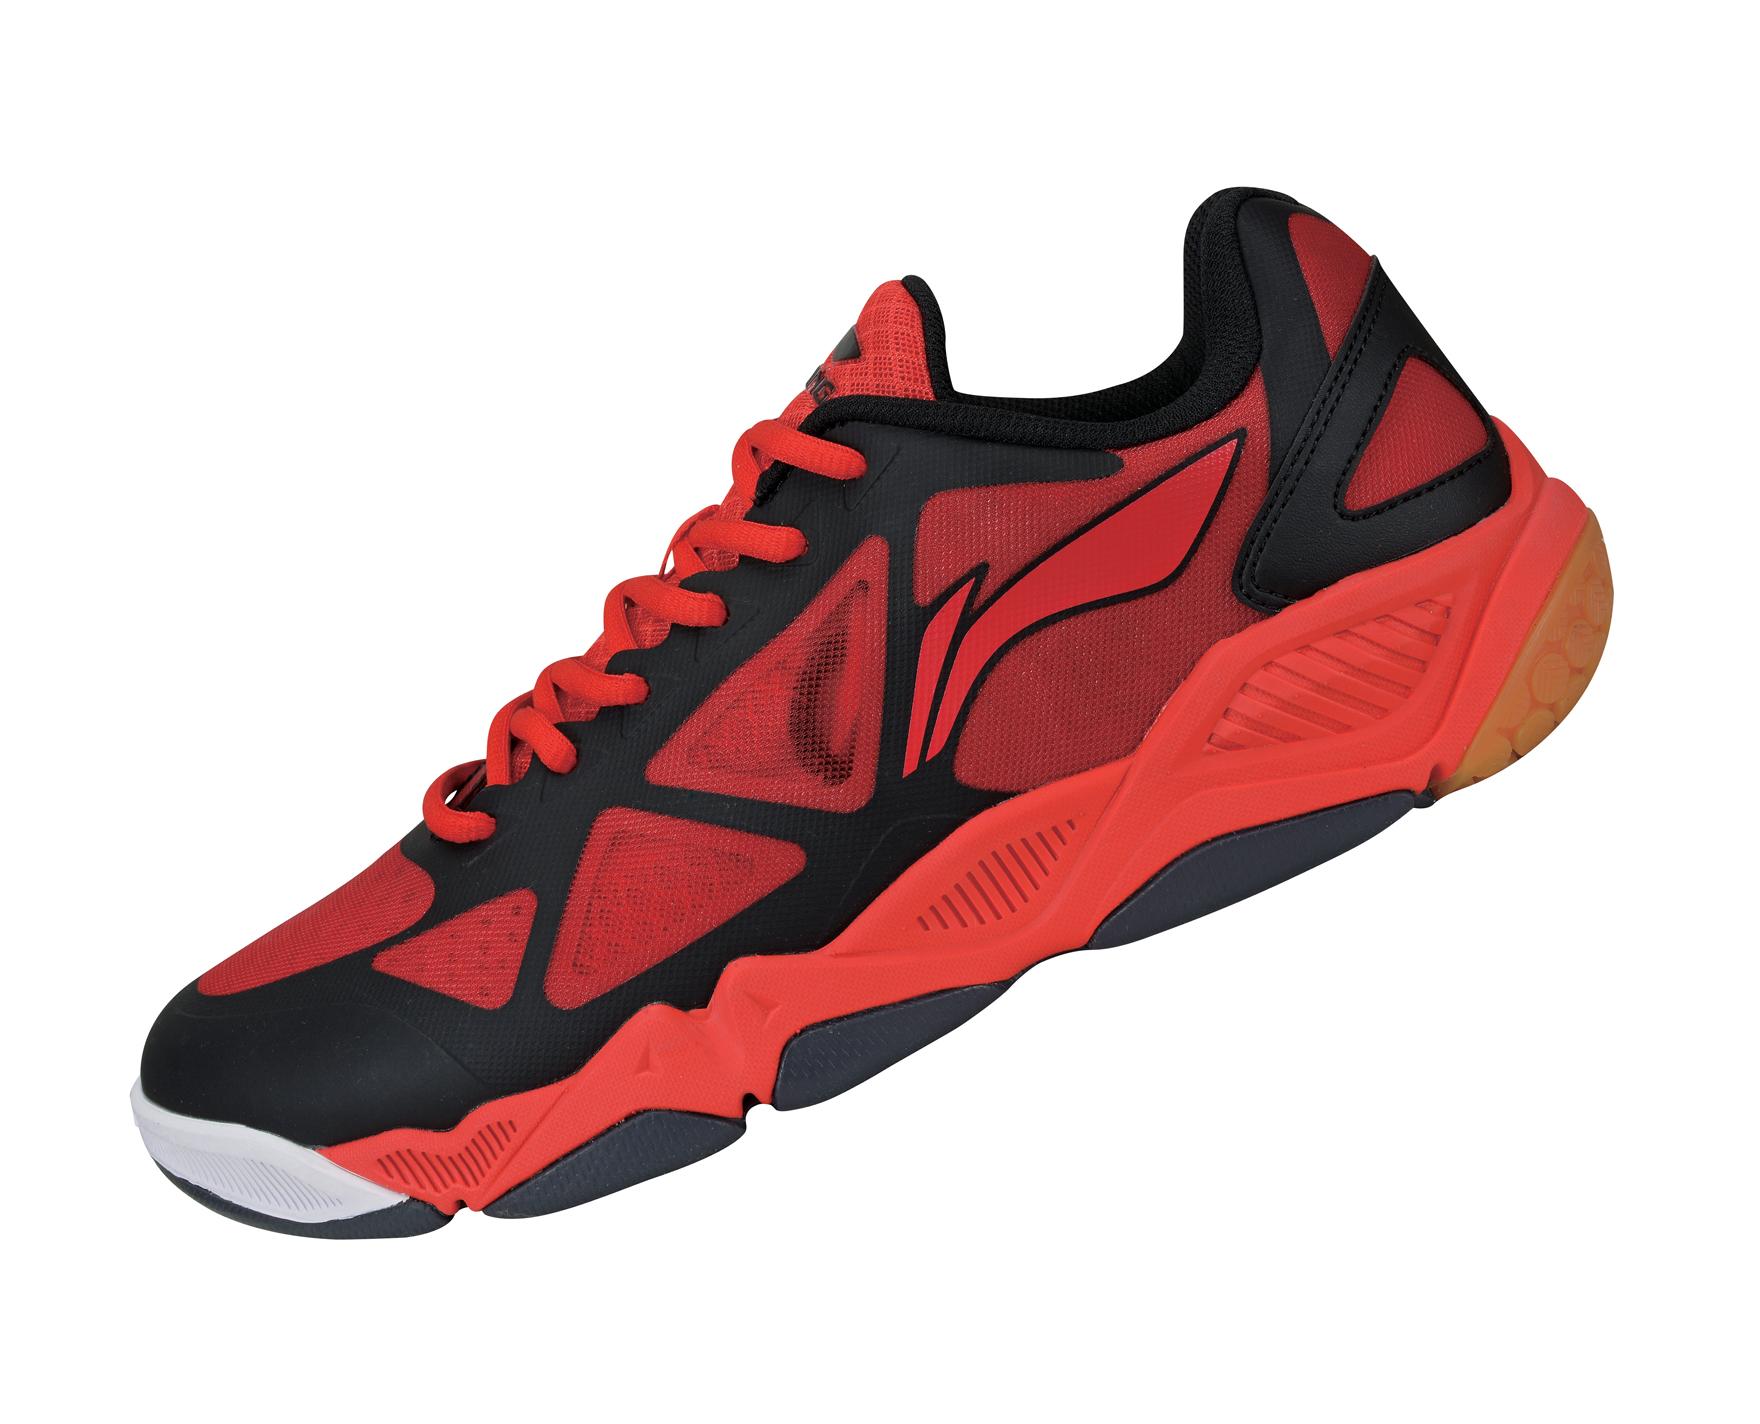 li ning men s badminton shoes badminton footwear aytm037 1